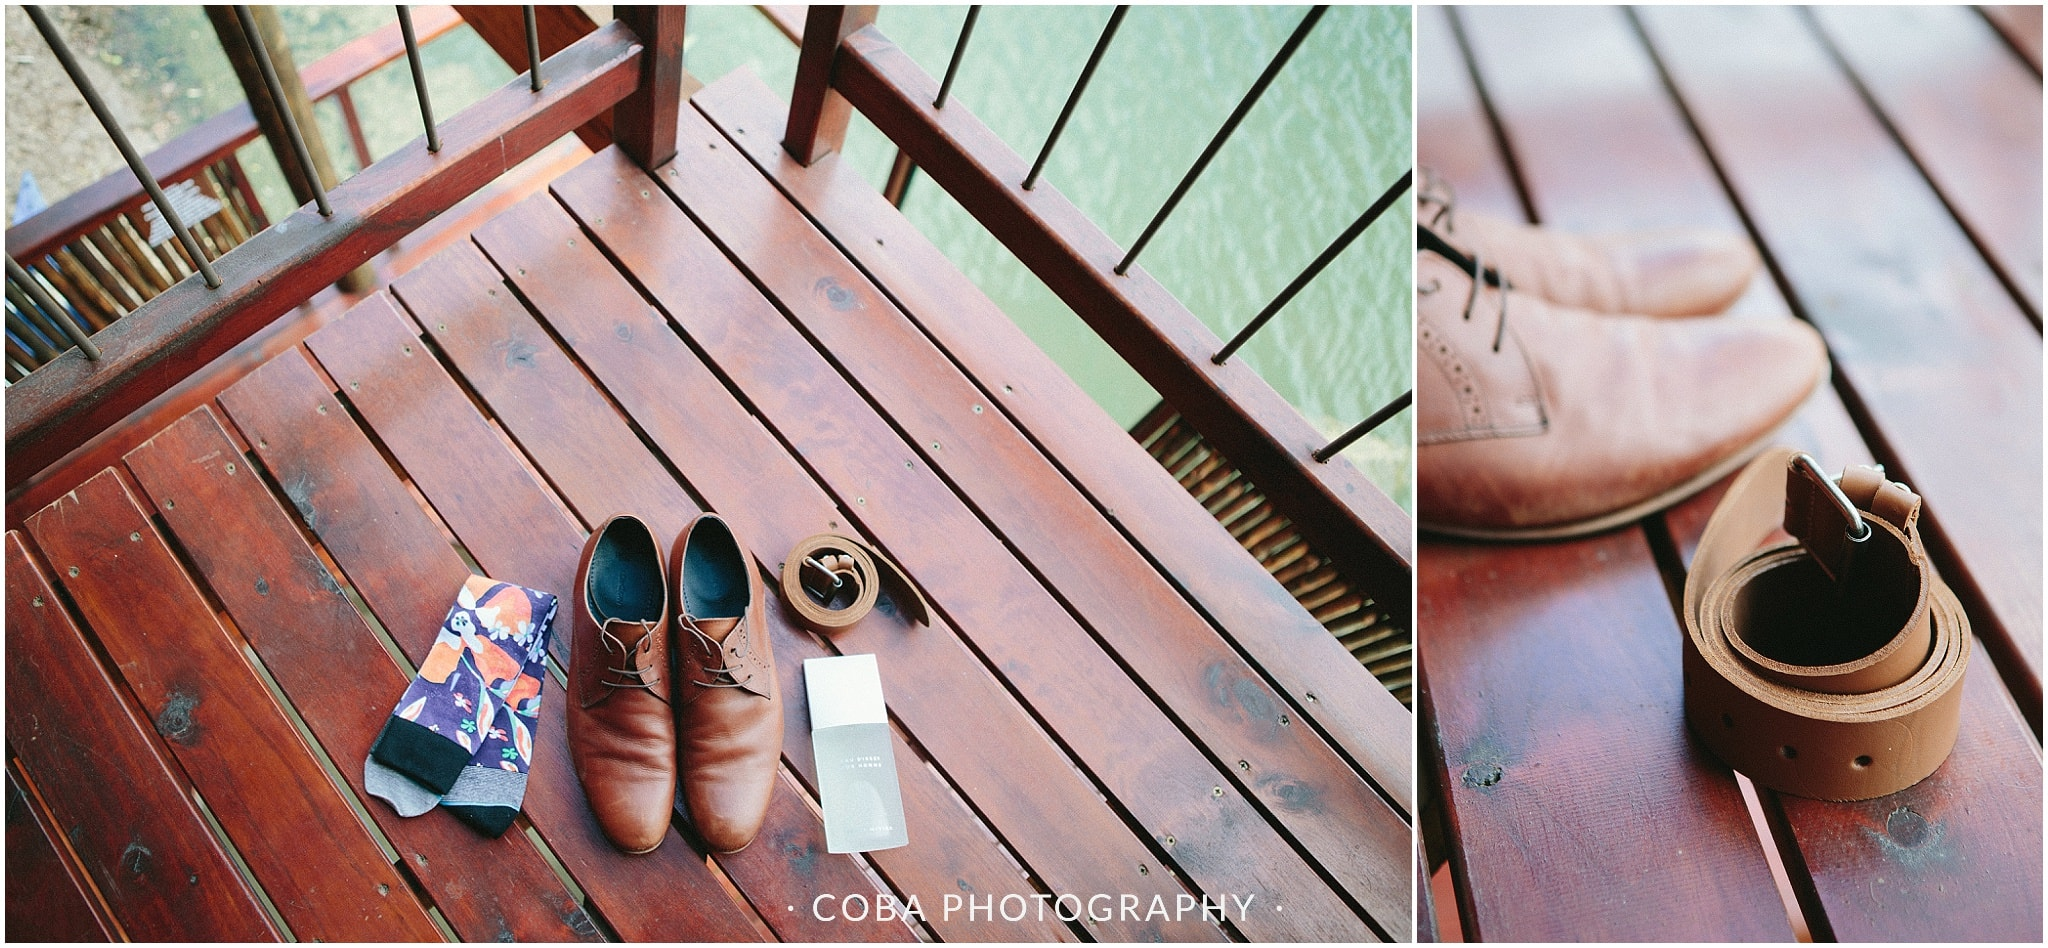 John&Pad - Olive Rock - Coba Photography (34)